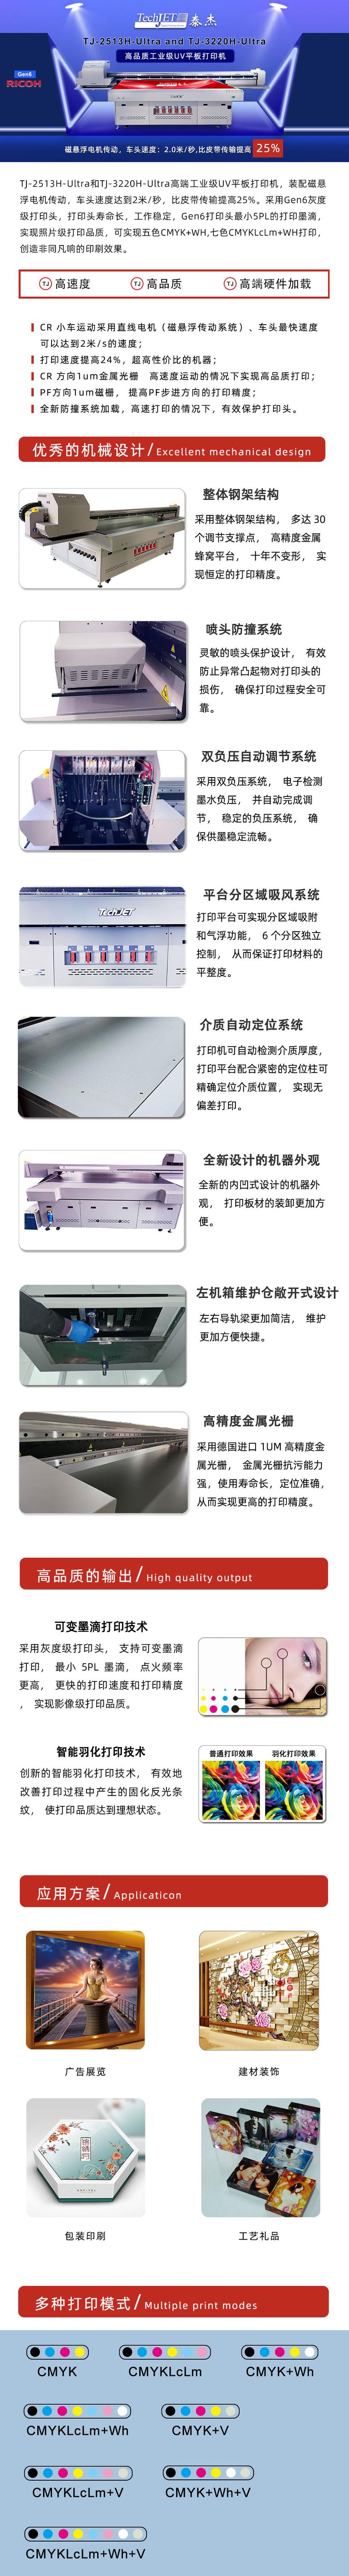 TJ-2513H-Ultra中文产品说明.jpg